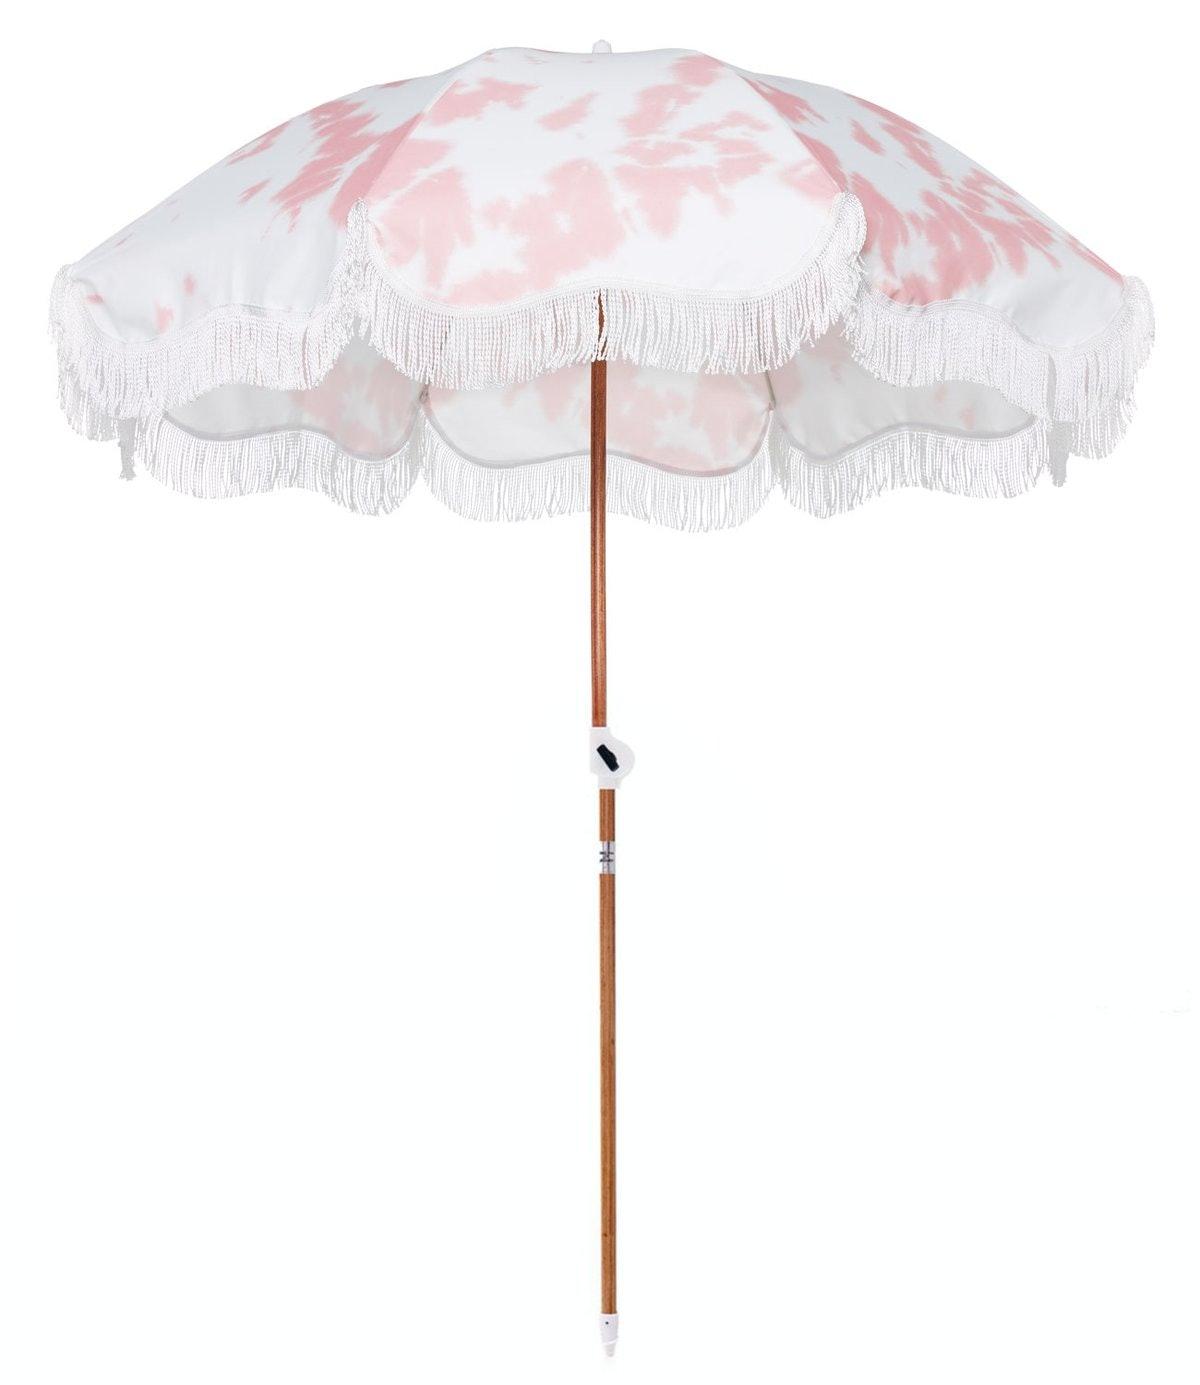 The Holiday Beach Umbrella - Tie Dye